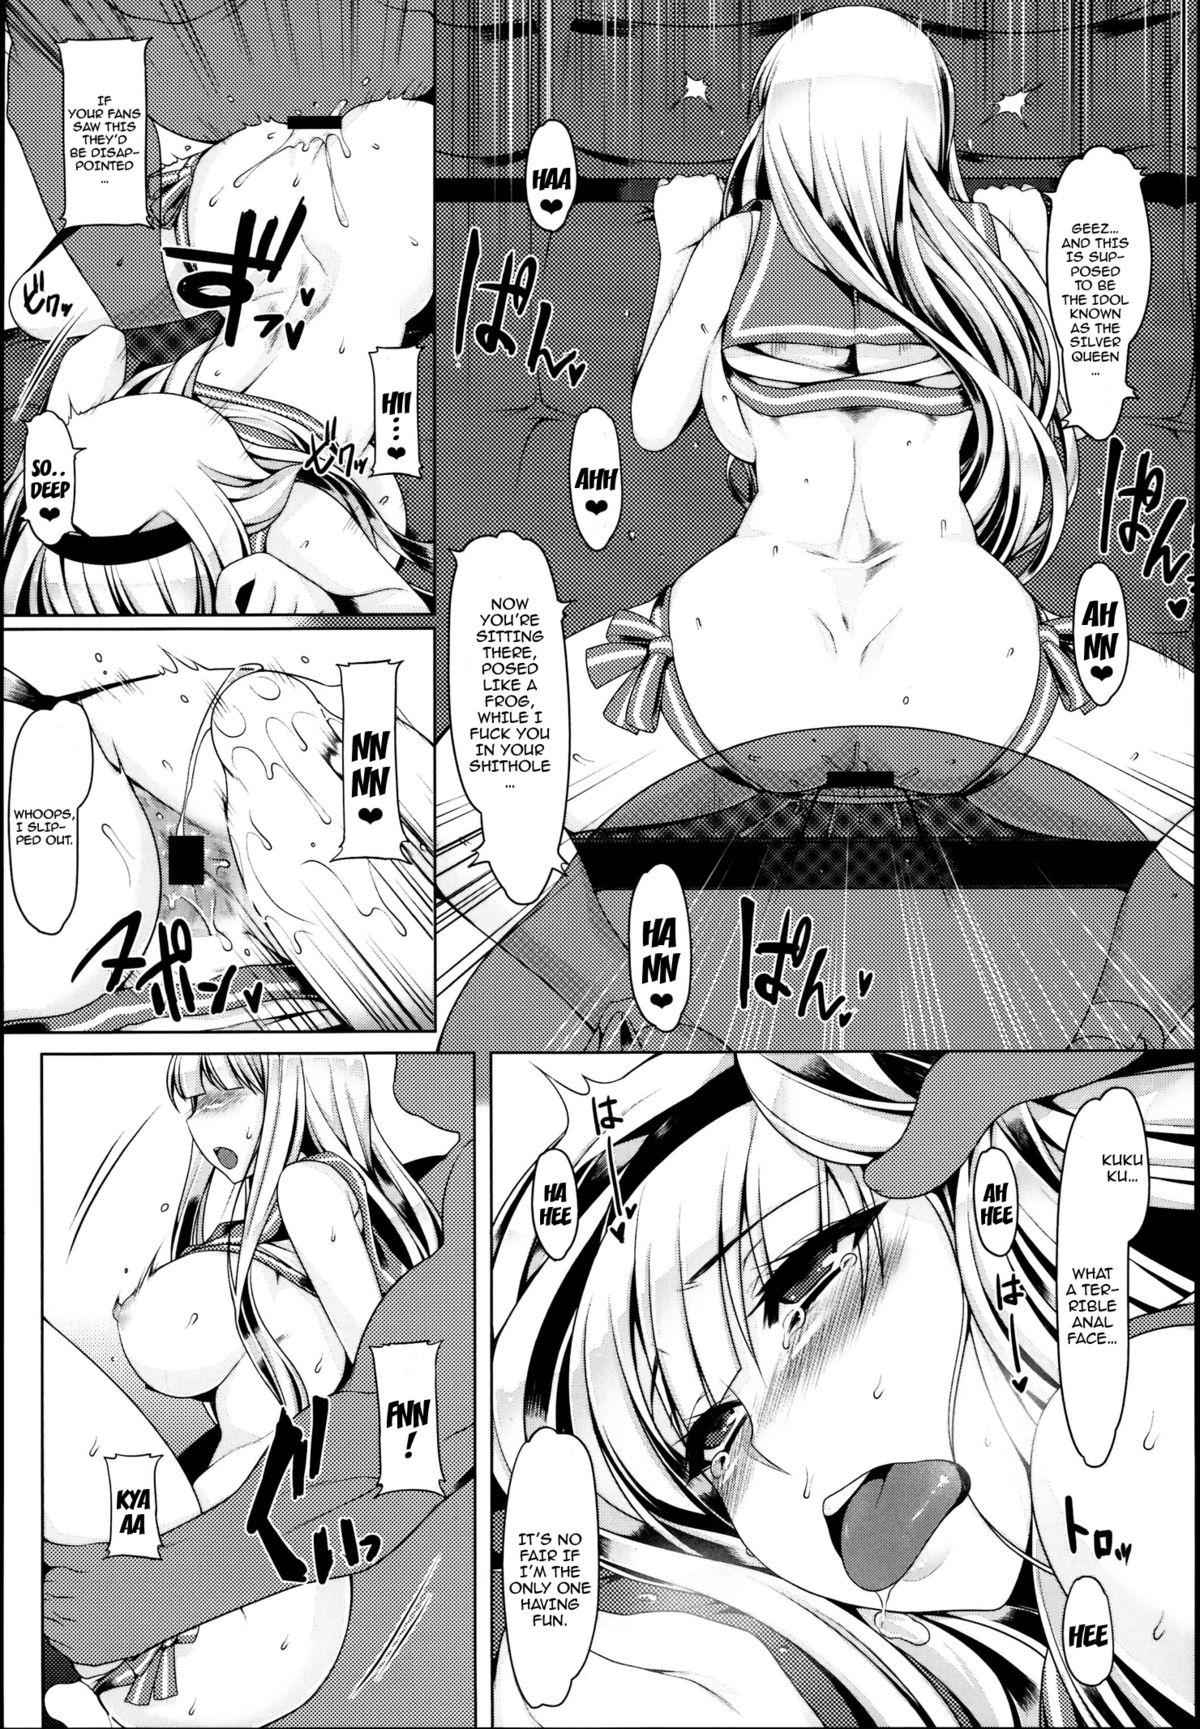 (C86) [Ruiketsuan (Namidame)] Oshiri-Hime no Koufuku   Anal-Princess's Happiness (THE iDOLM@STER) [English] [doujin-moe.us] 13